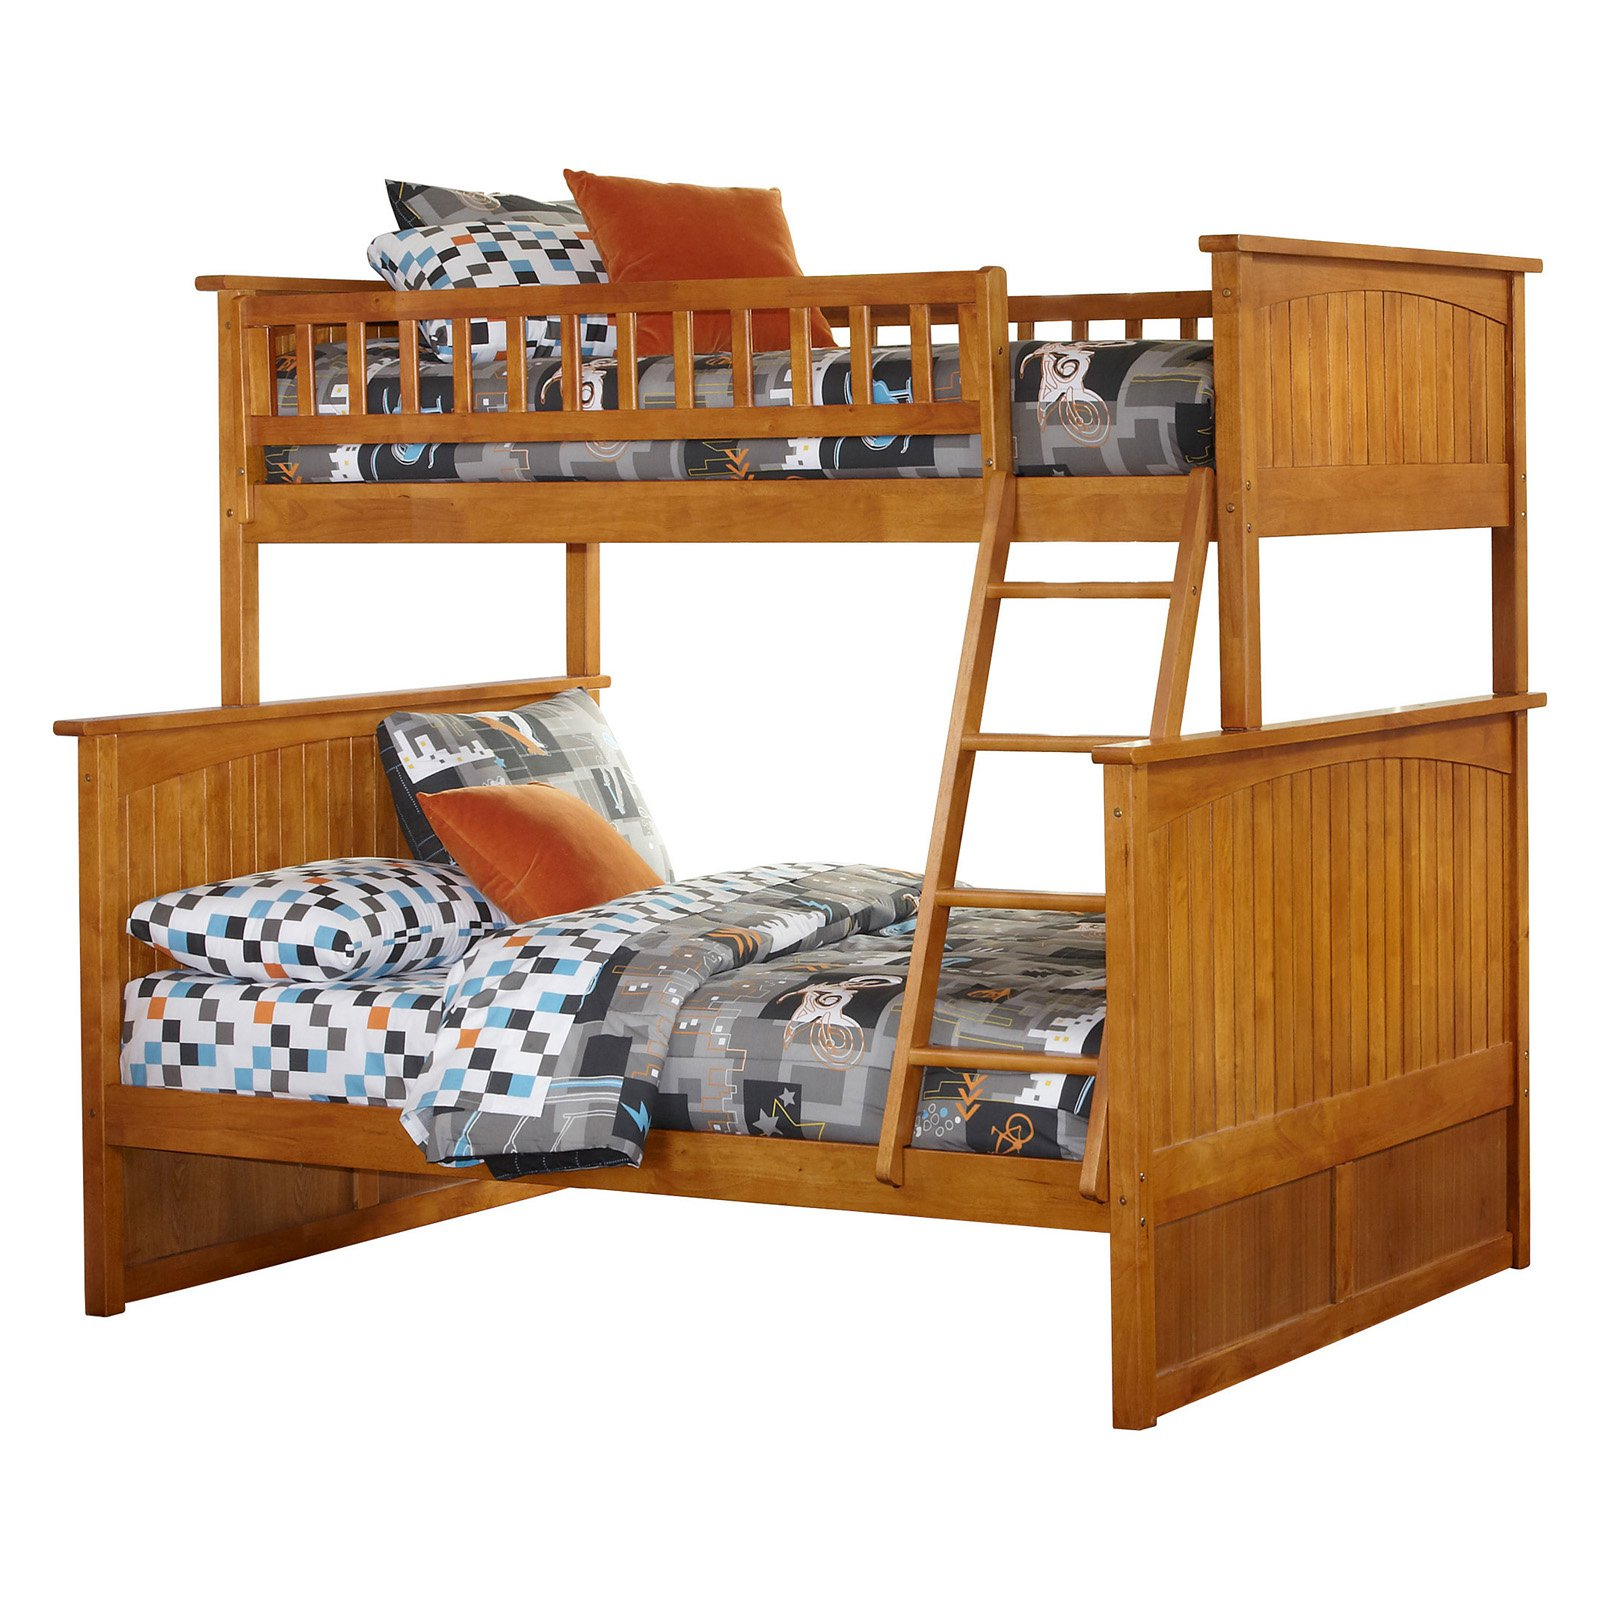 Atlantic Furniture Nantucket Twin Over Full Bunk Bed by Atlantic Furniture